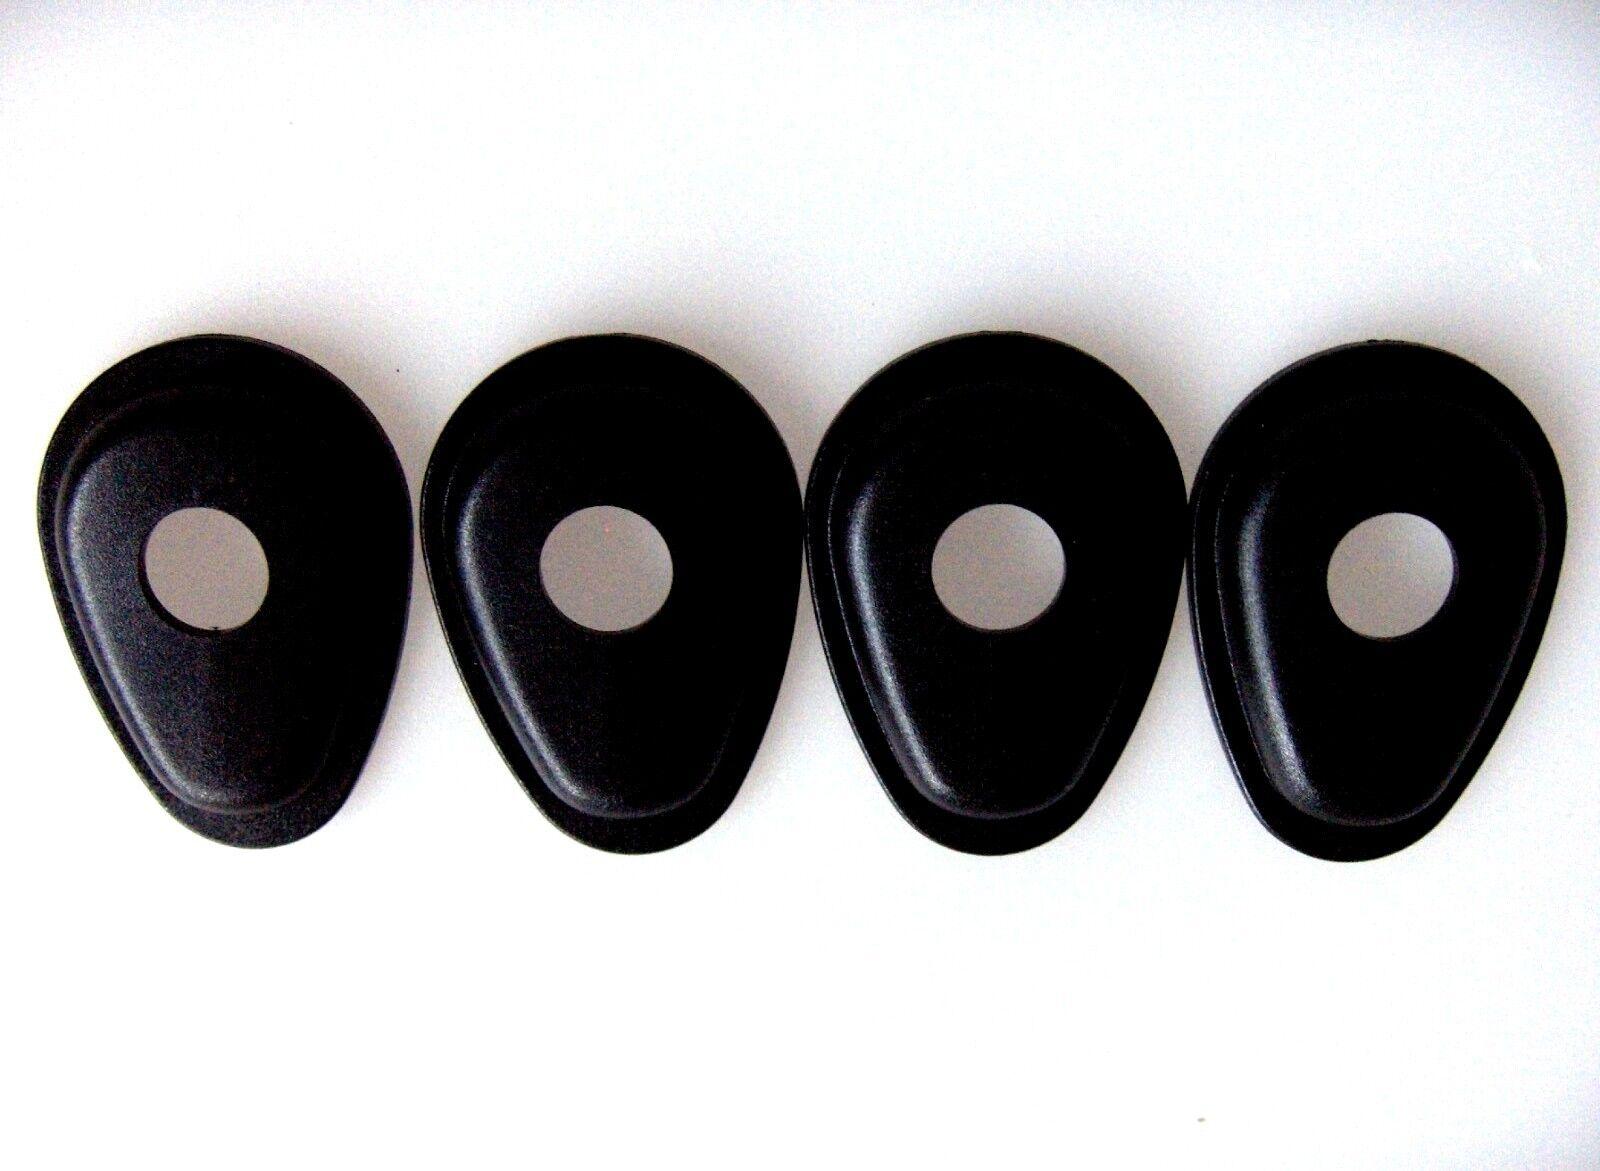 ►2X ADAPTER KABEL STECKER FÜR MINIBLINKER YAMAHA FZS1000 Fazer//600,TDM 900,YZFR1